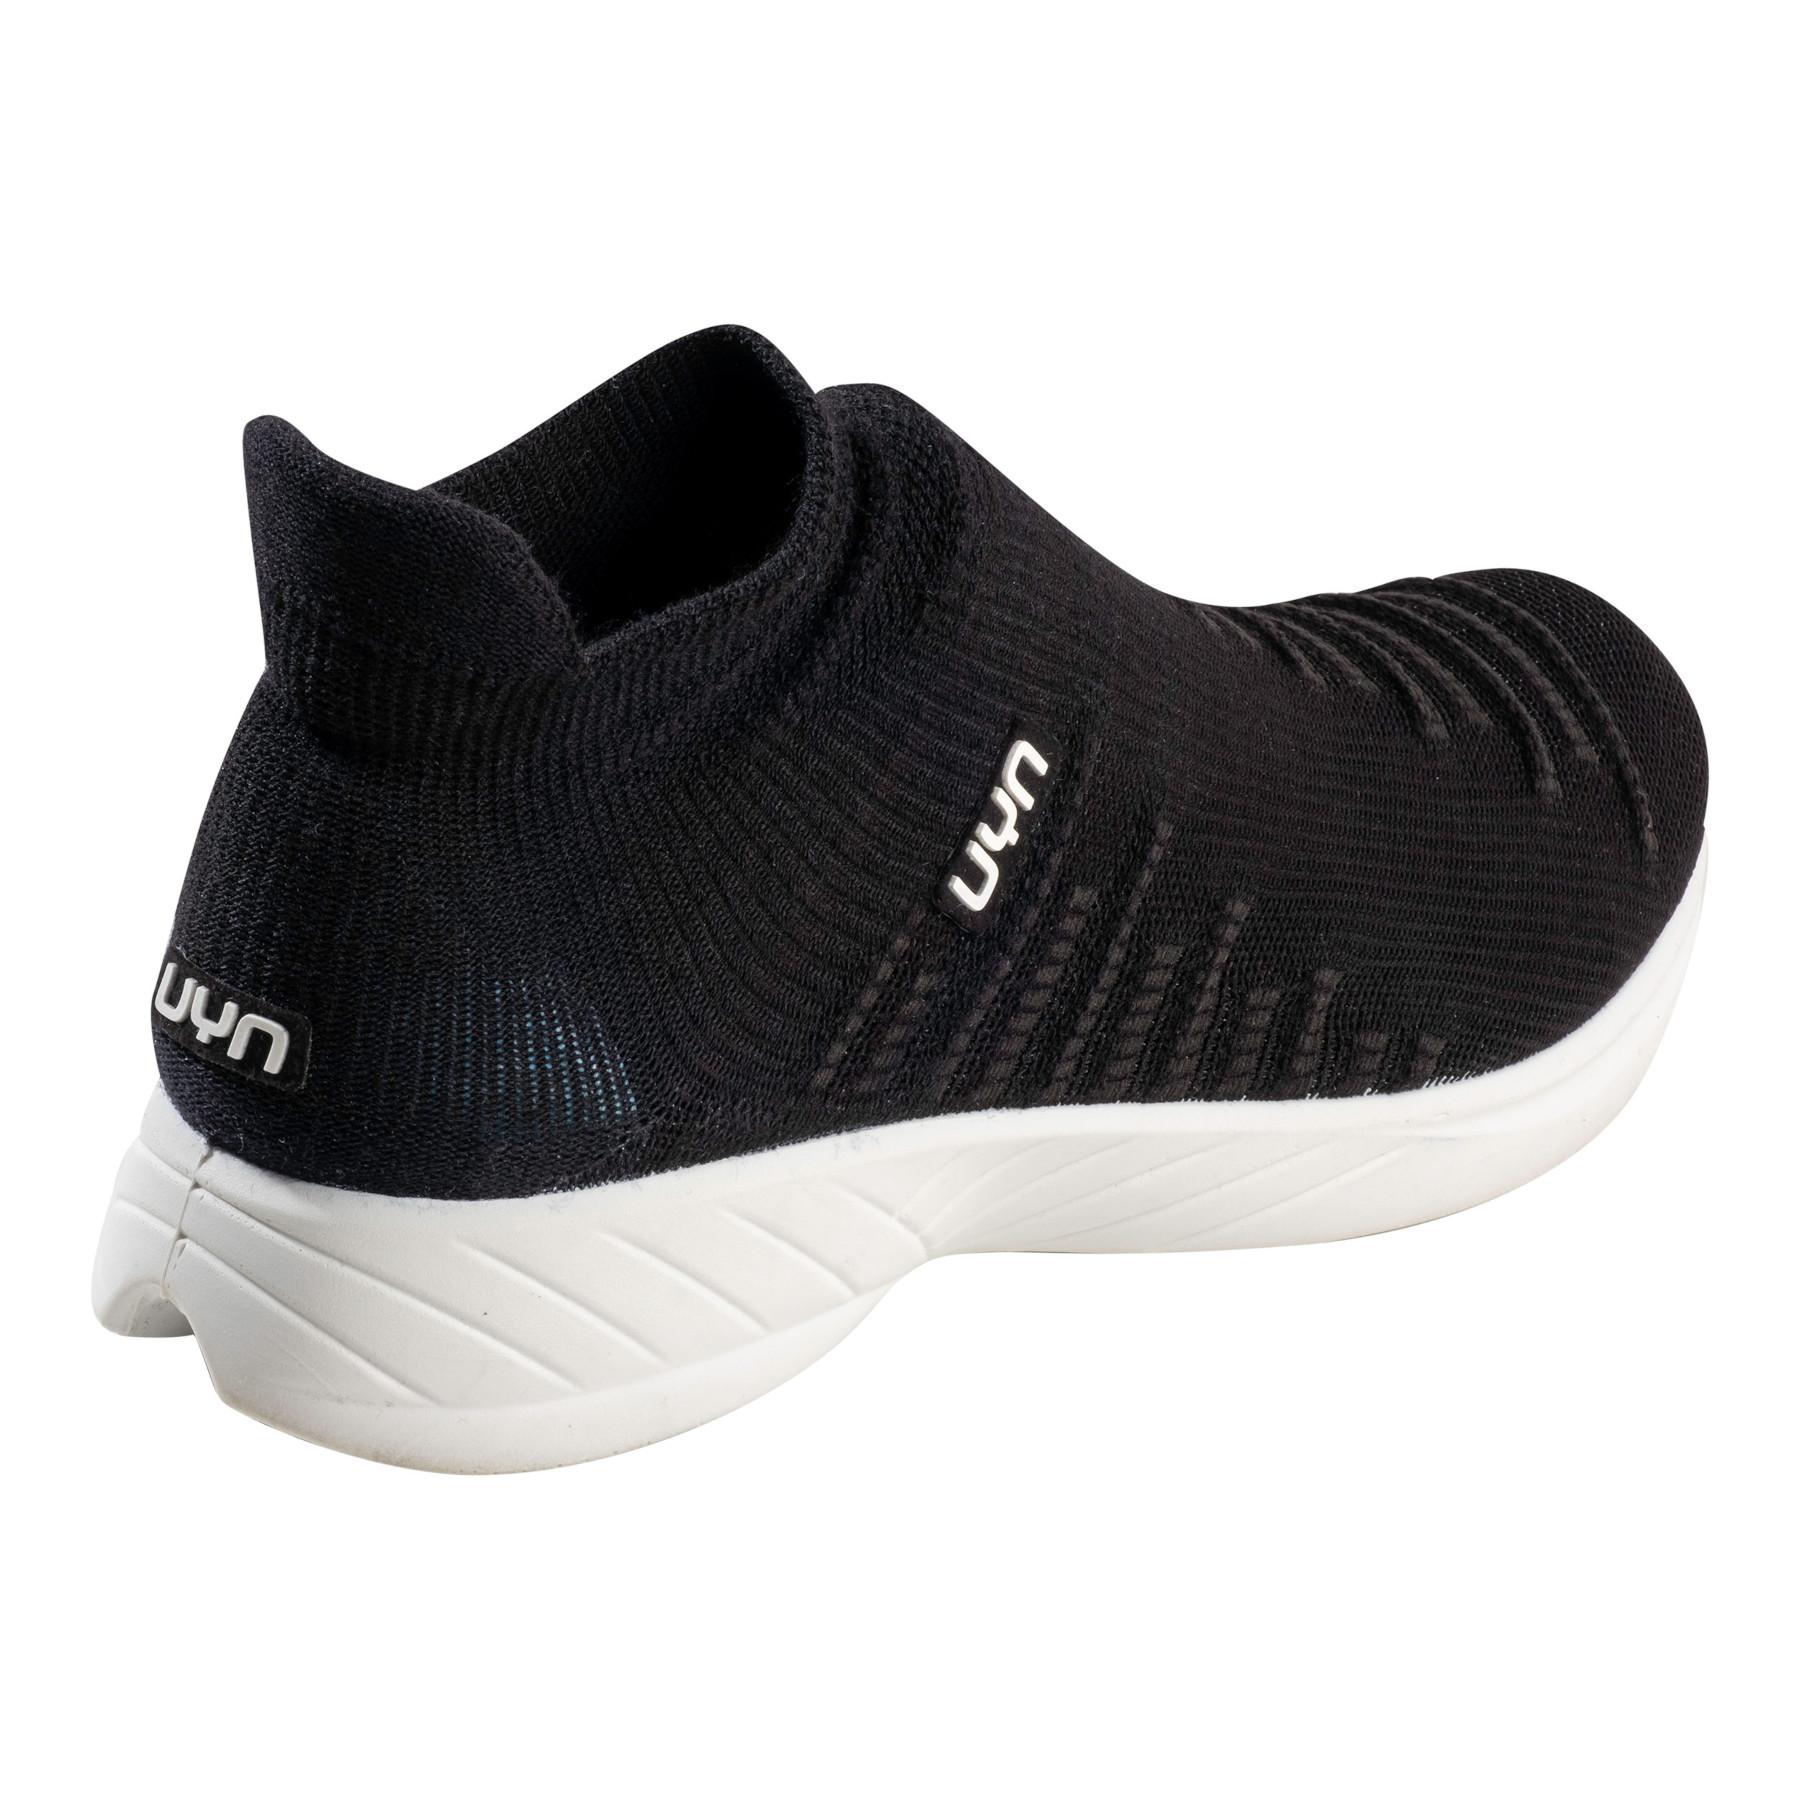 Image of UYN X-Cross Running Shoes - Optical Black/Black